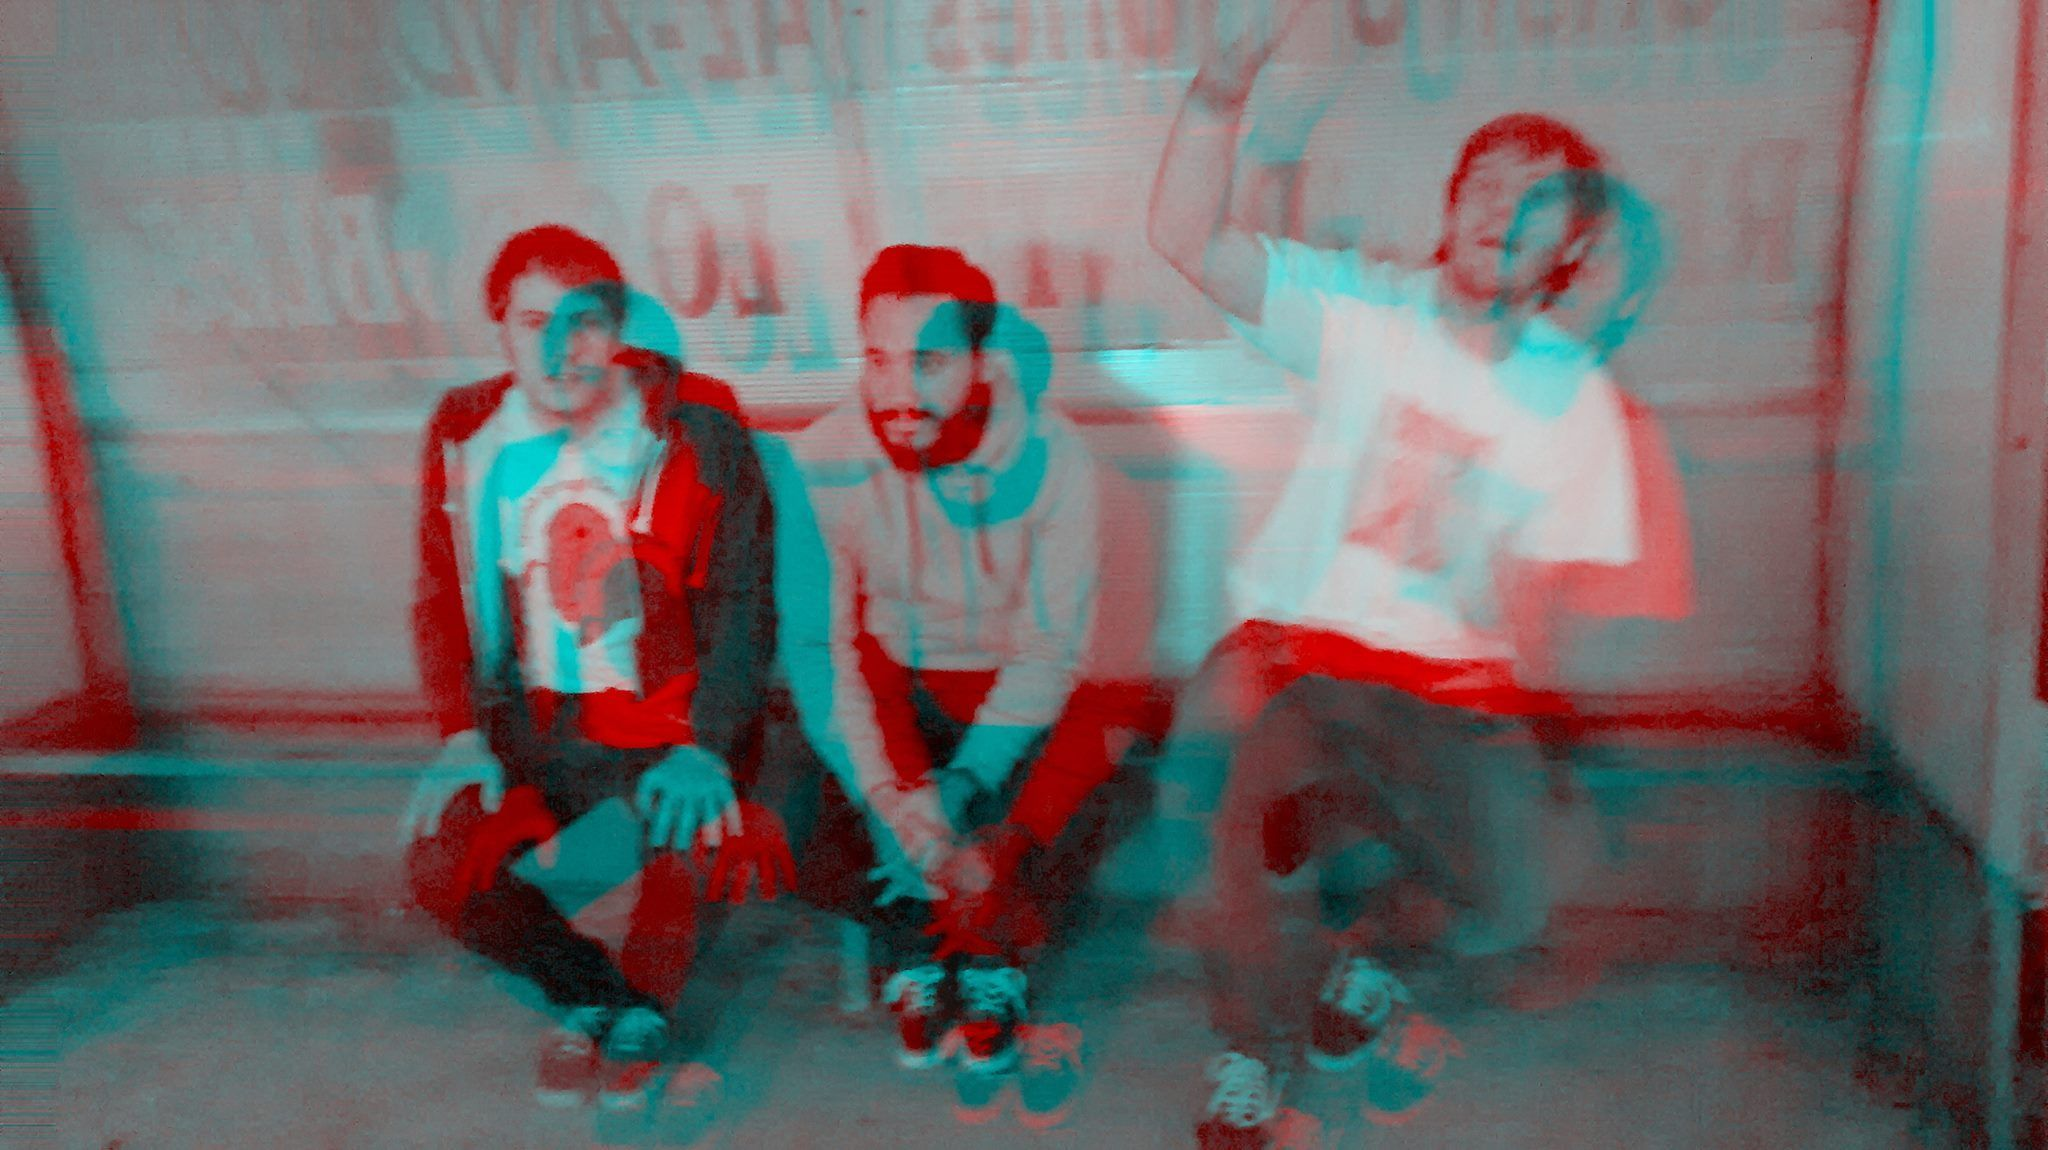 Soul Rubbers presentan su EP homónimo en la Entrevista Chamberga